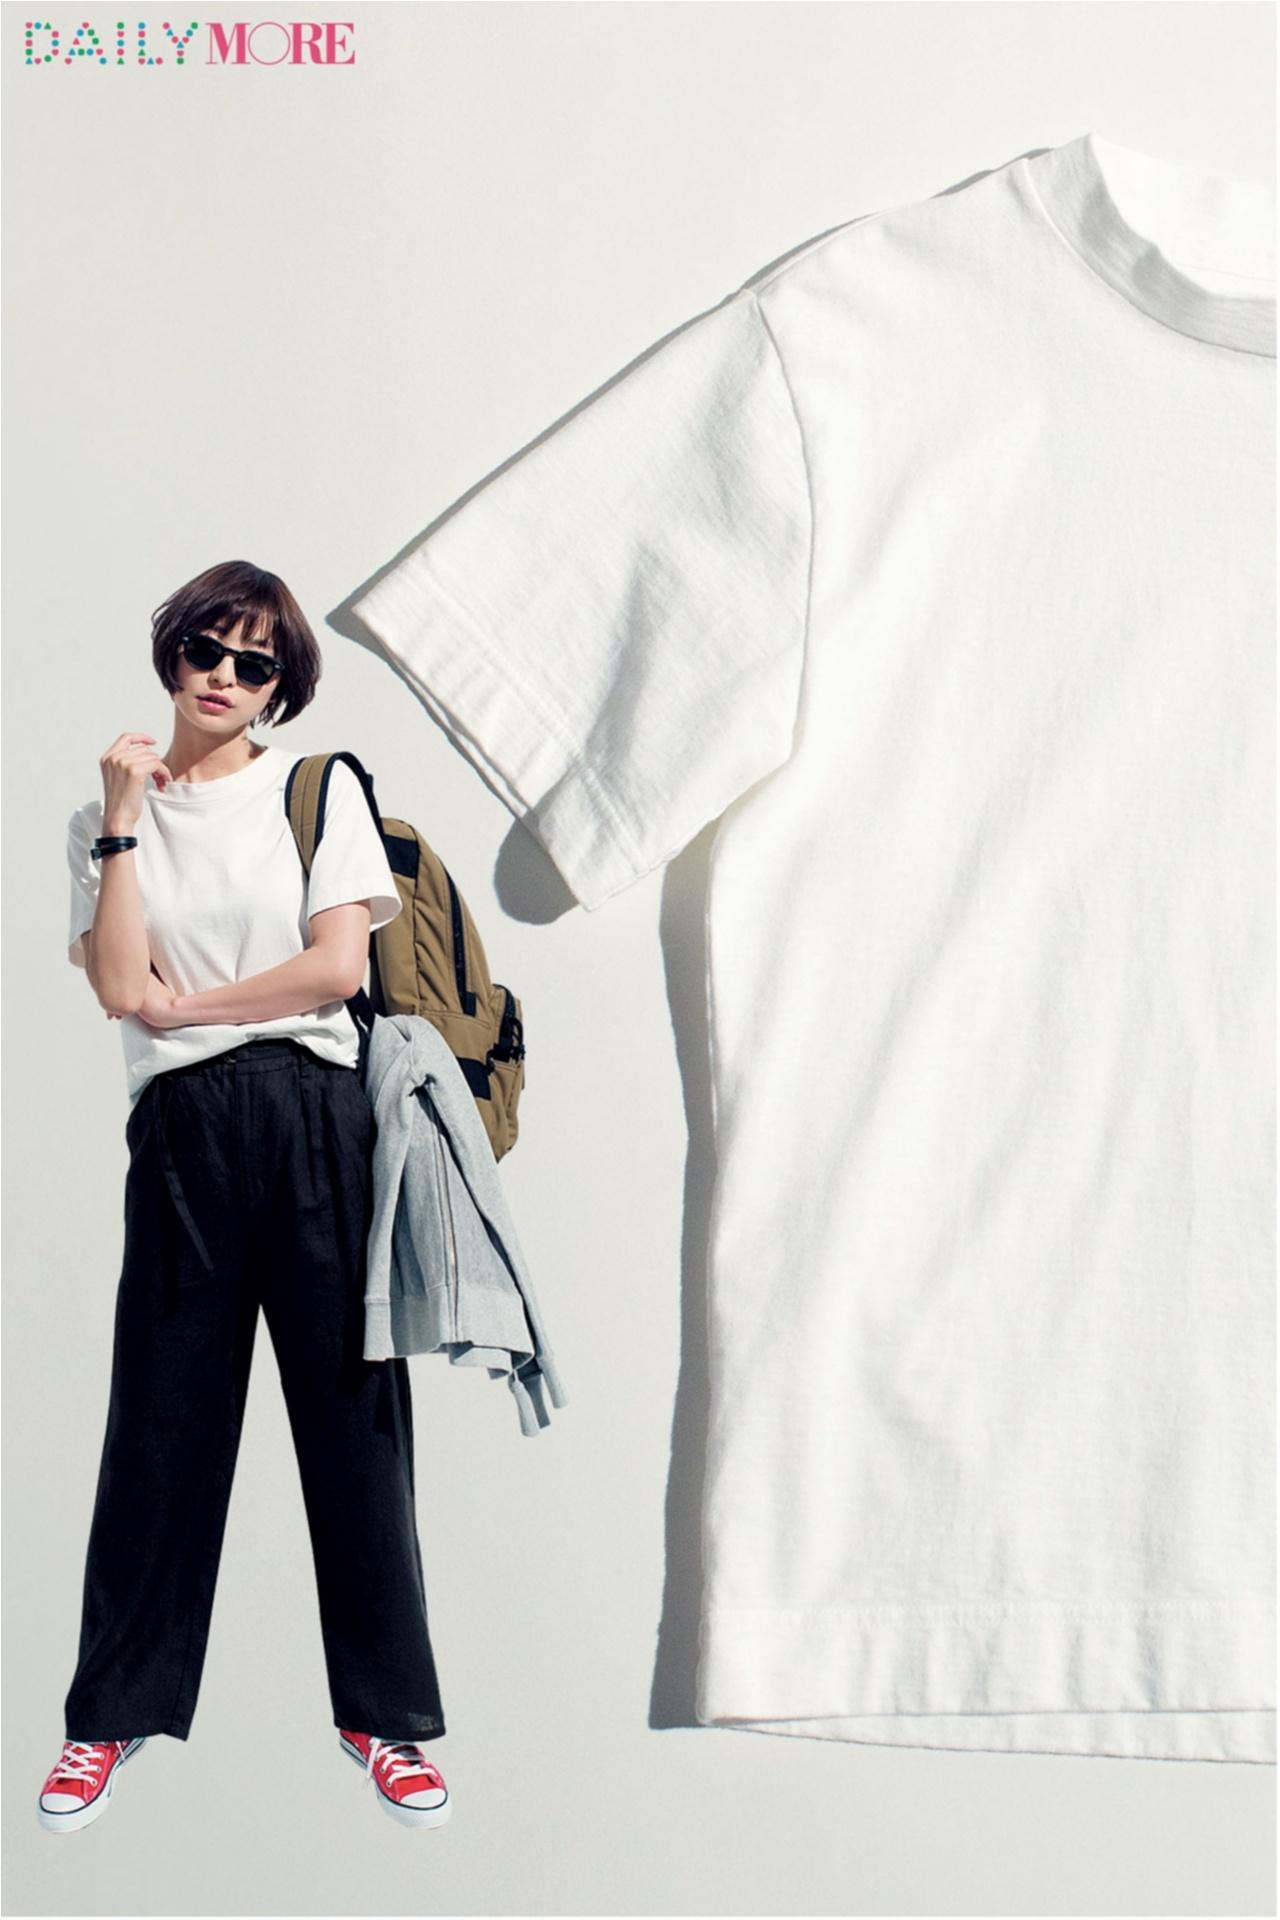 Tシャツ&ワイドパンツ……注目のアイテム記事が大人気♡ 今週の人気ランキングトップ3!_1